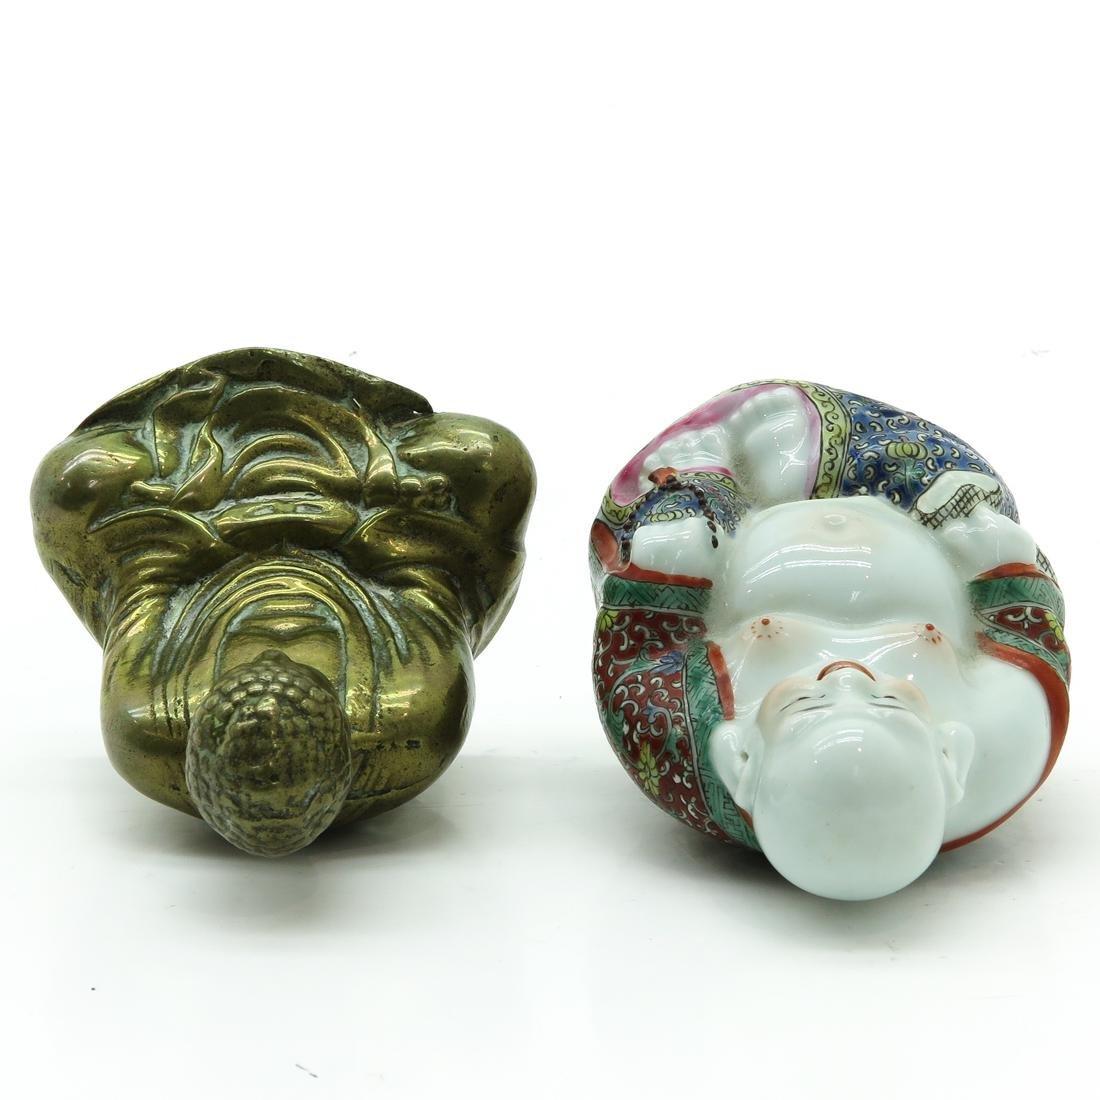 Lot of 2 Buddha Sculptures - 5